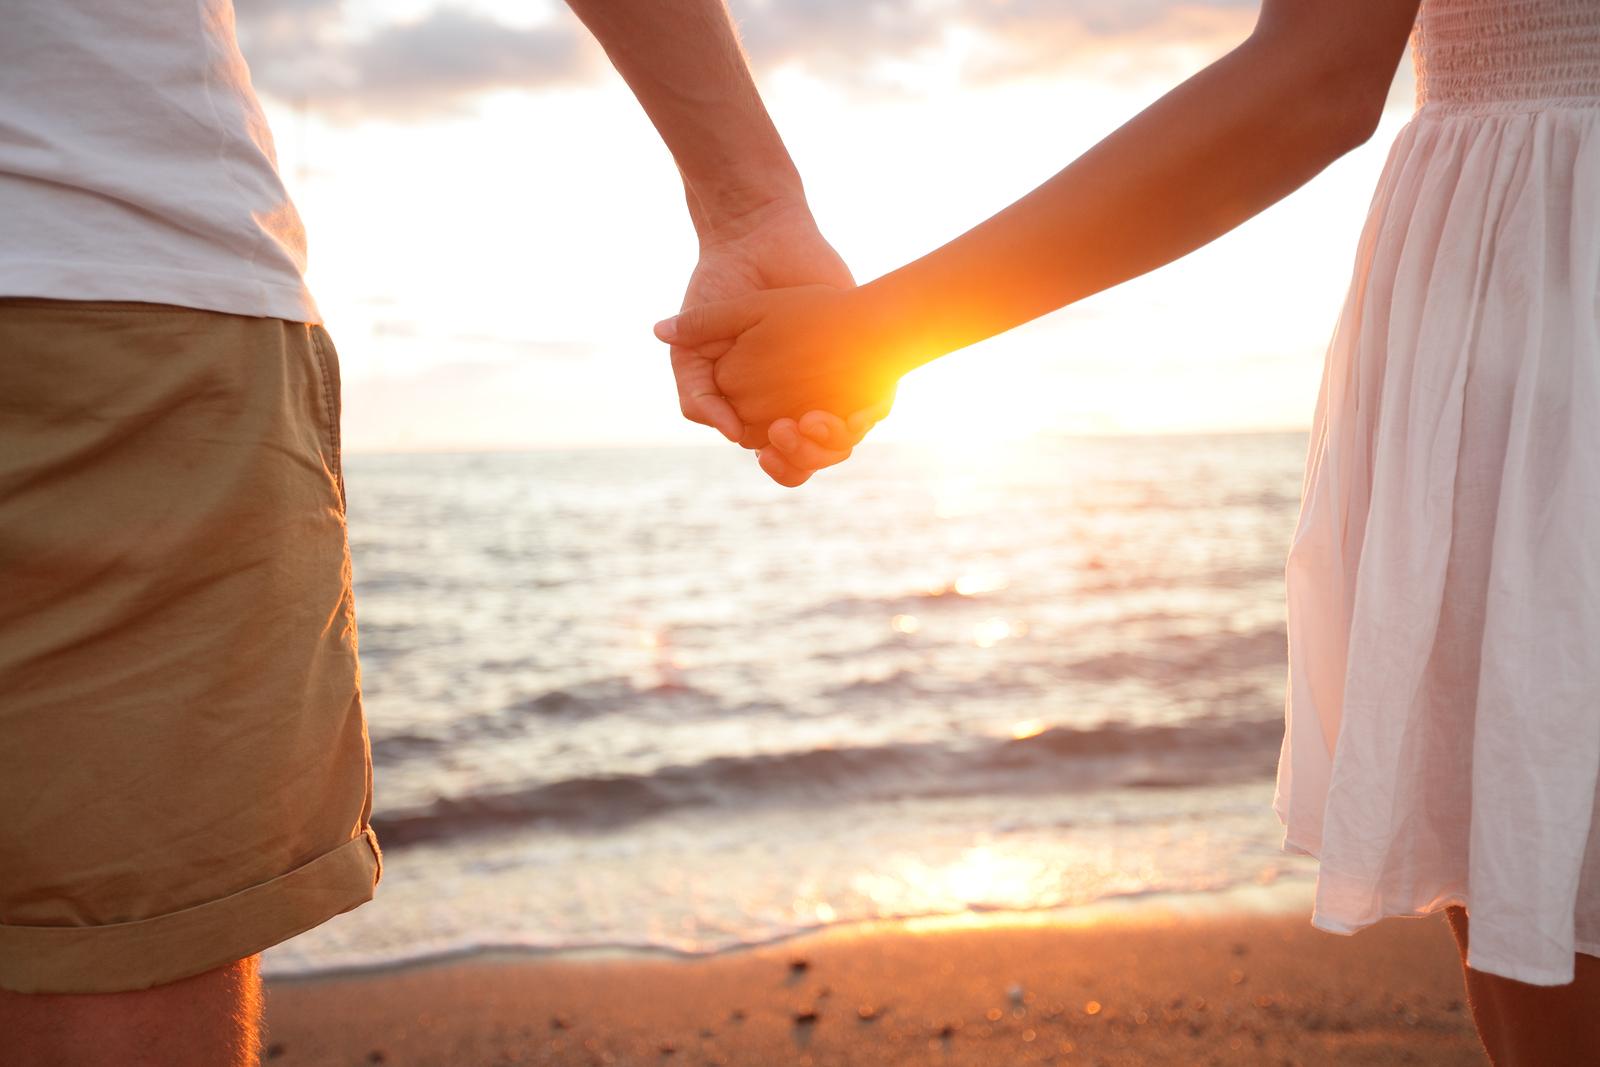 bigstock-Summer-couple-holding-hands-at-43917166.jpg